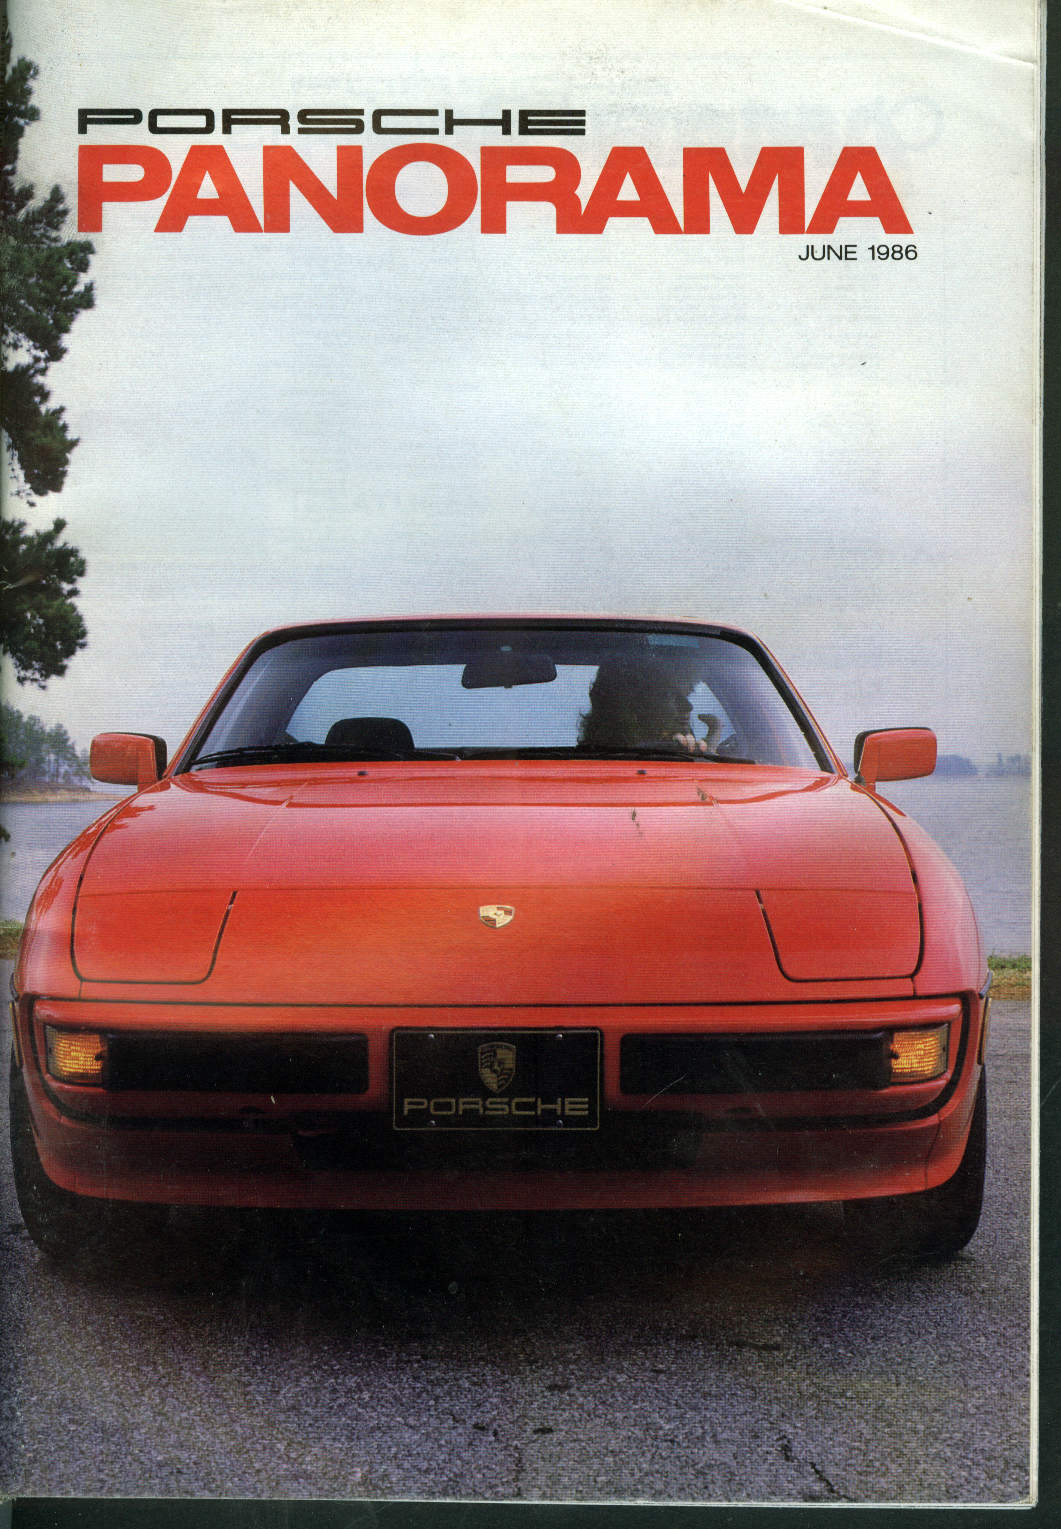 PORSCHE PANORAMA 924S Fran Ussery 959 914 6 1986